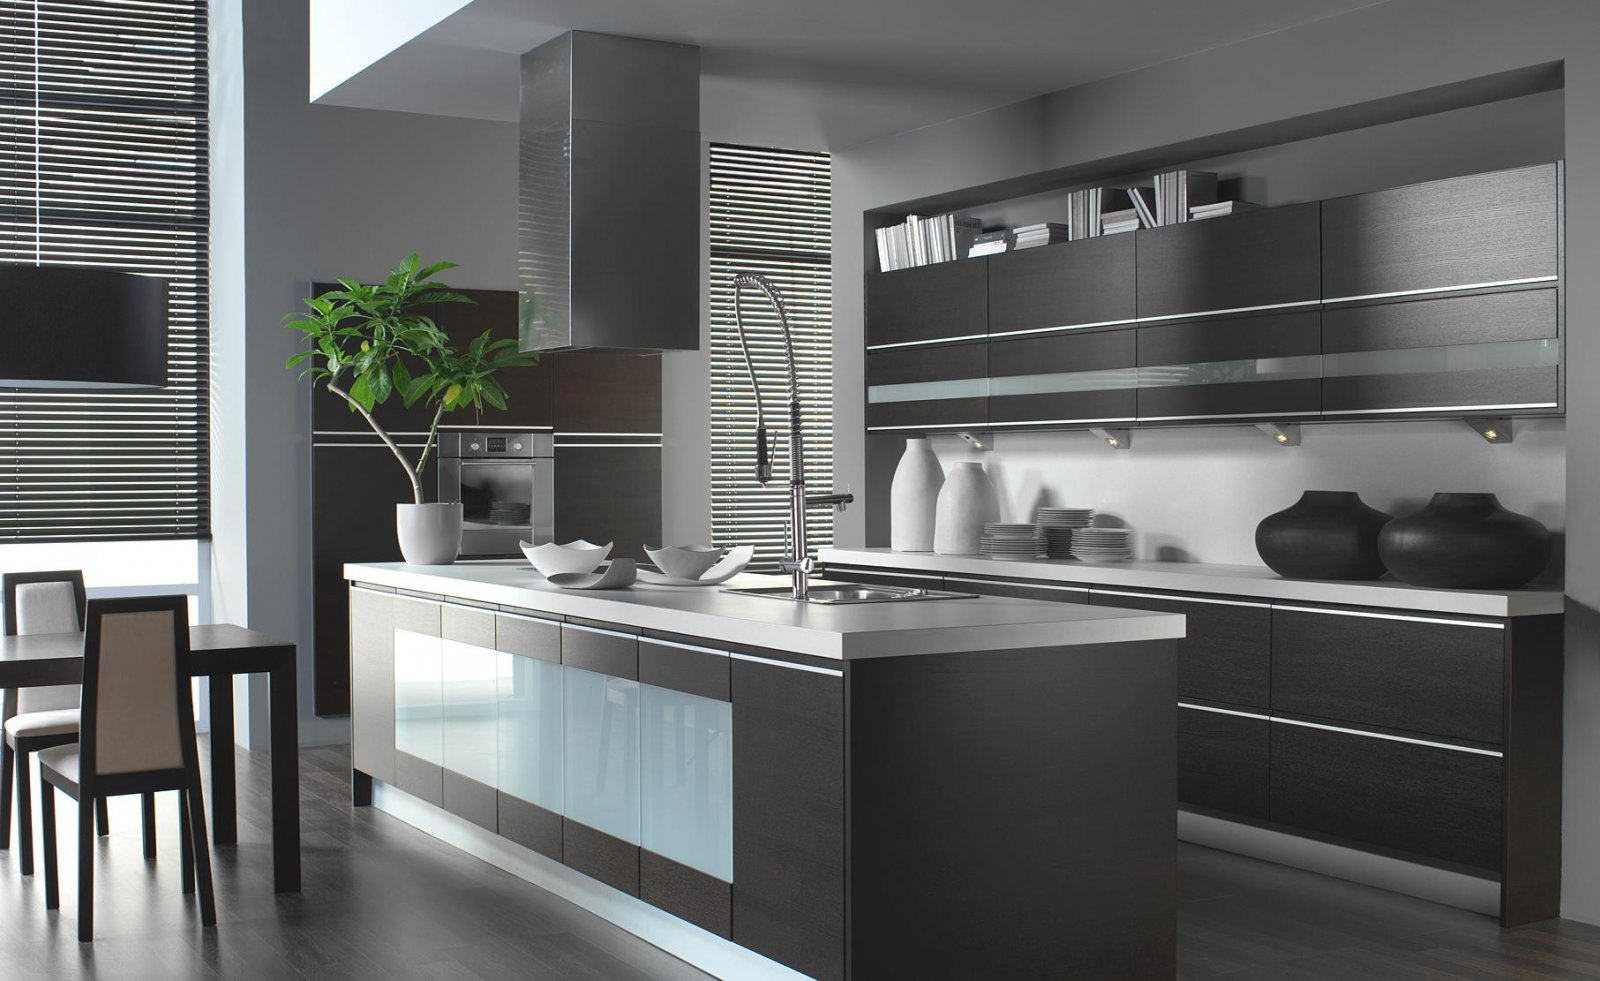 Оформление кухни в стиле хай-тек